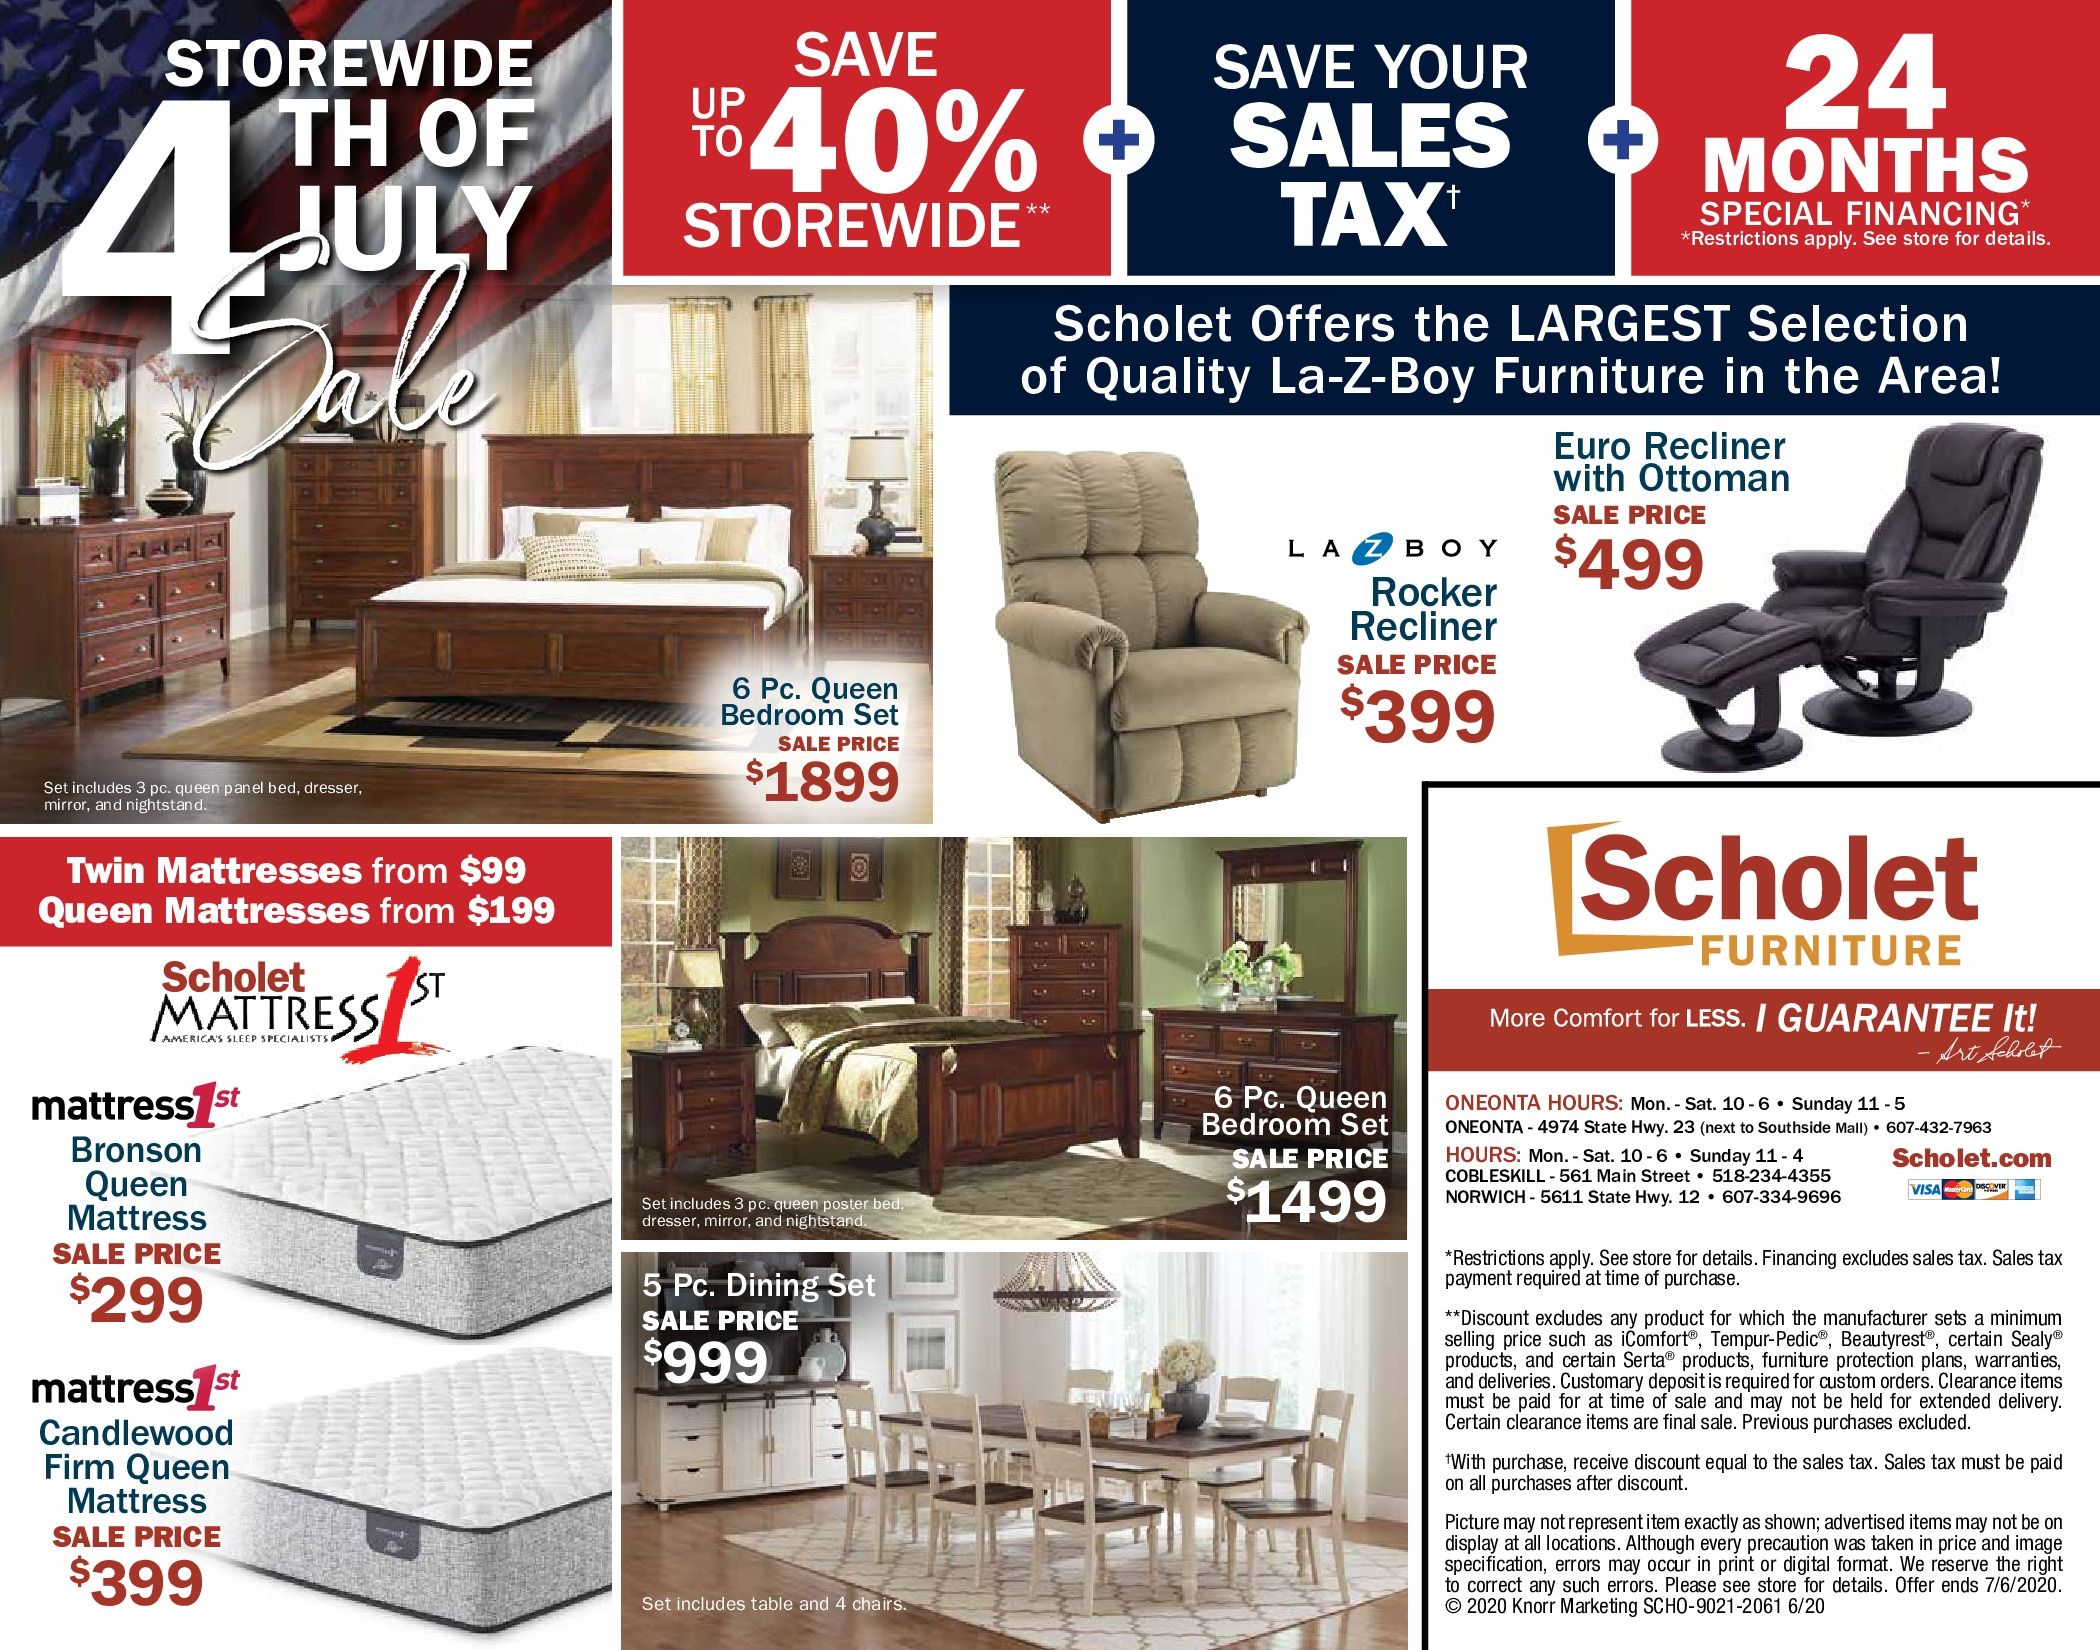 SCHO-9021-2061-July4thSale-SpecialsPG